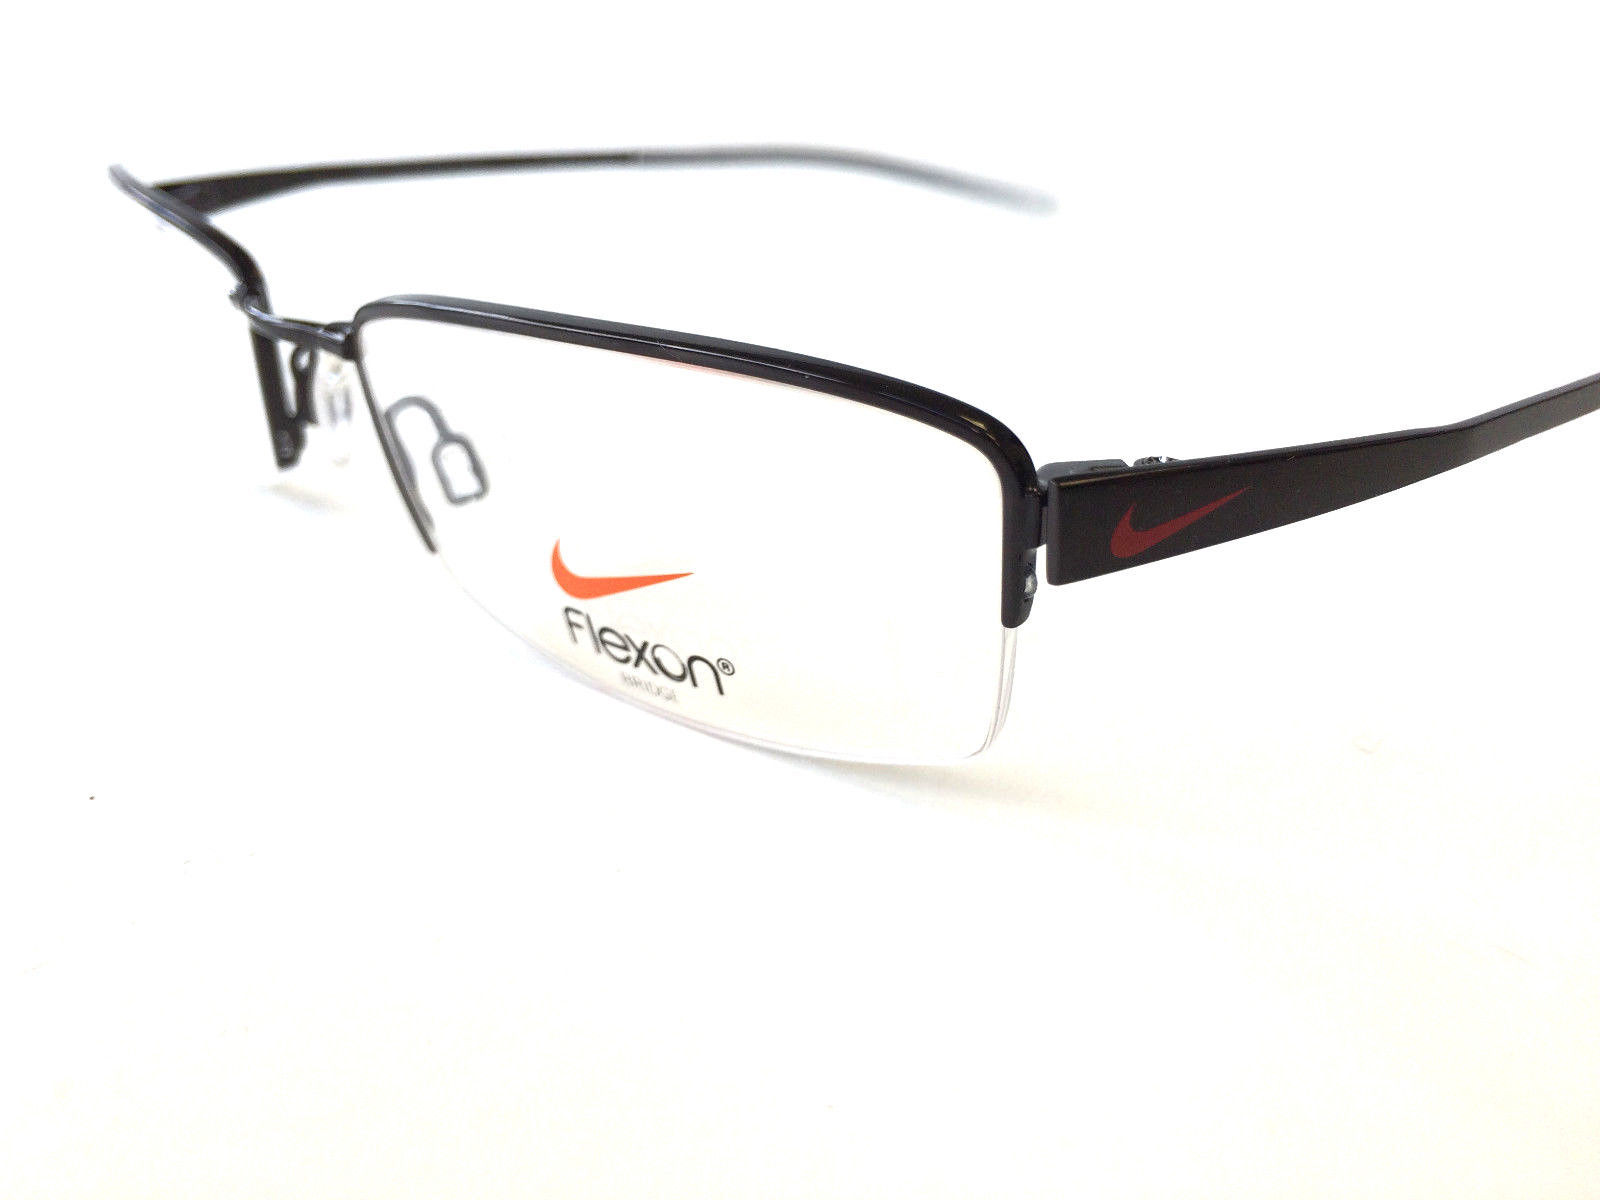 Flexon Rimless Eyeglasses | ISEFAC Alternance